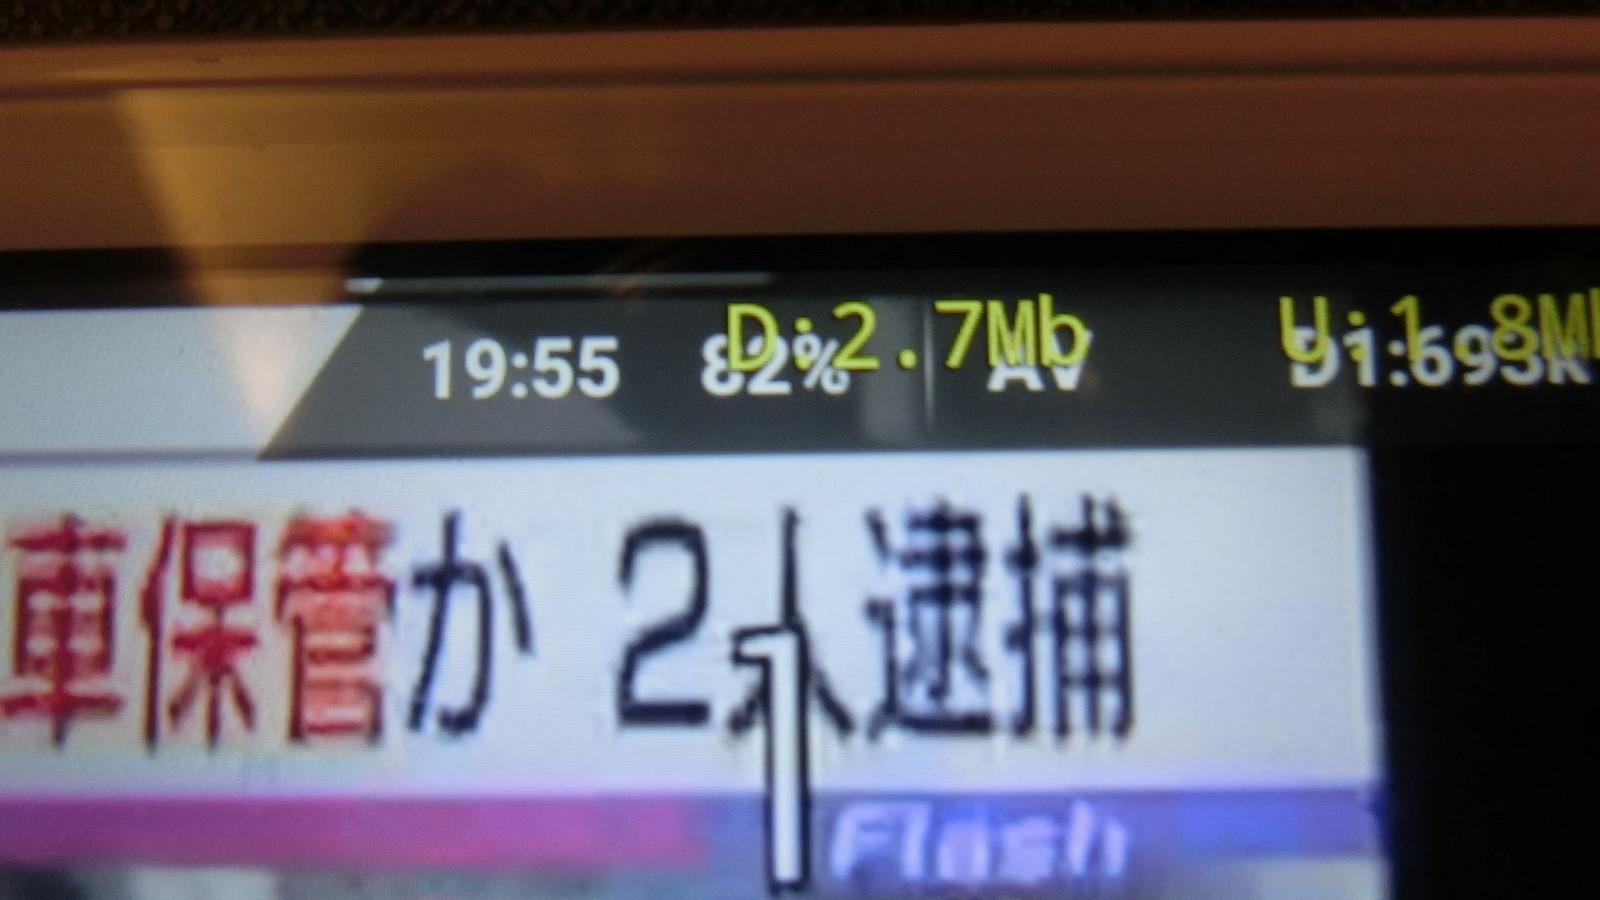 Wifi_27mbps